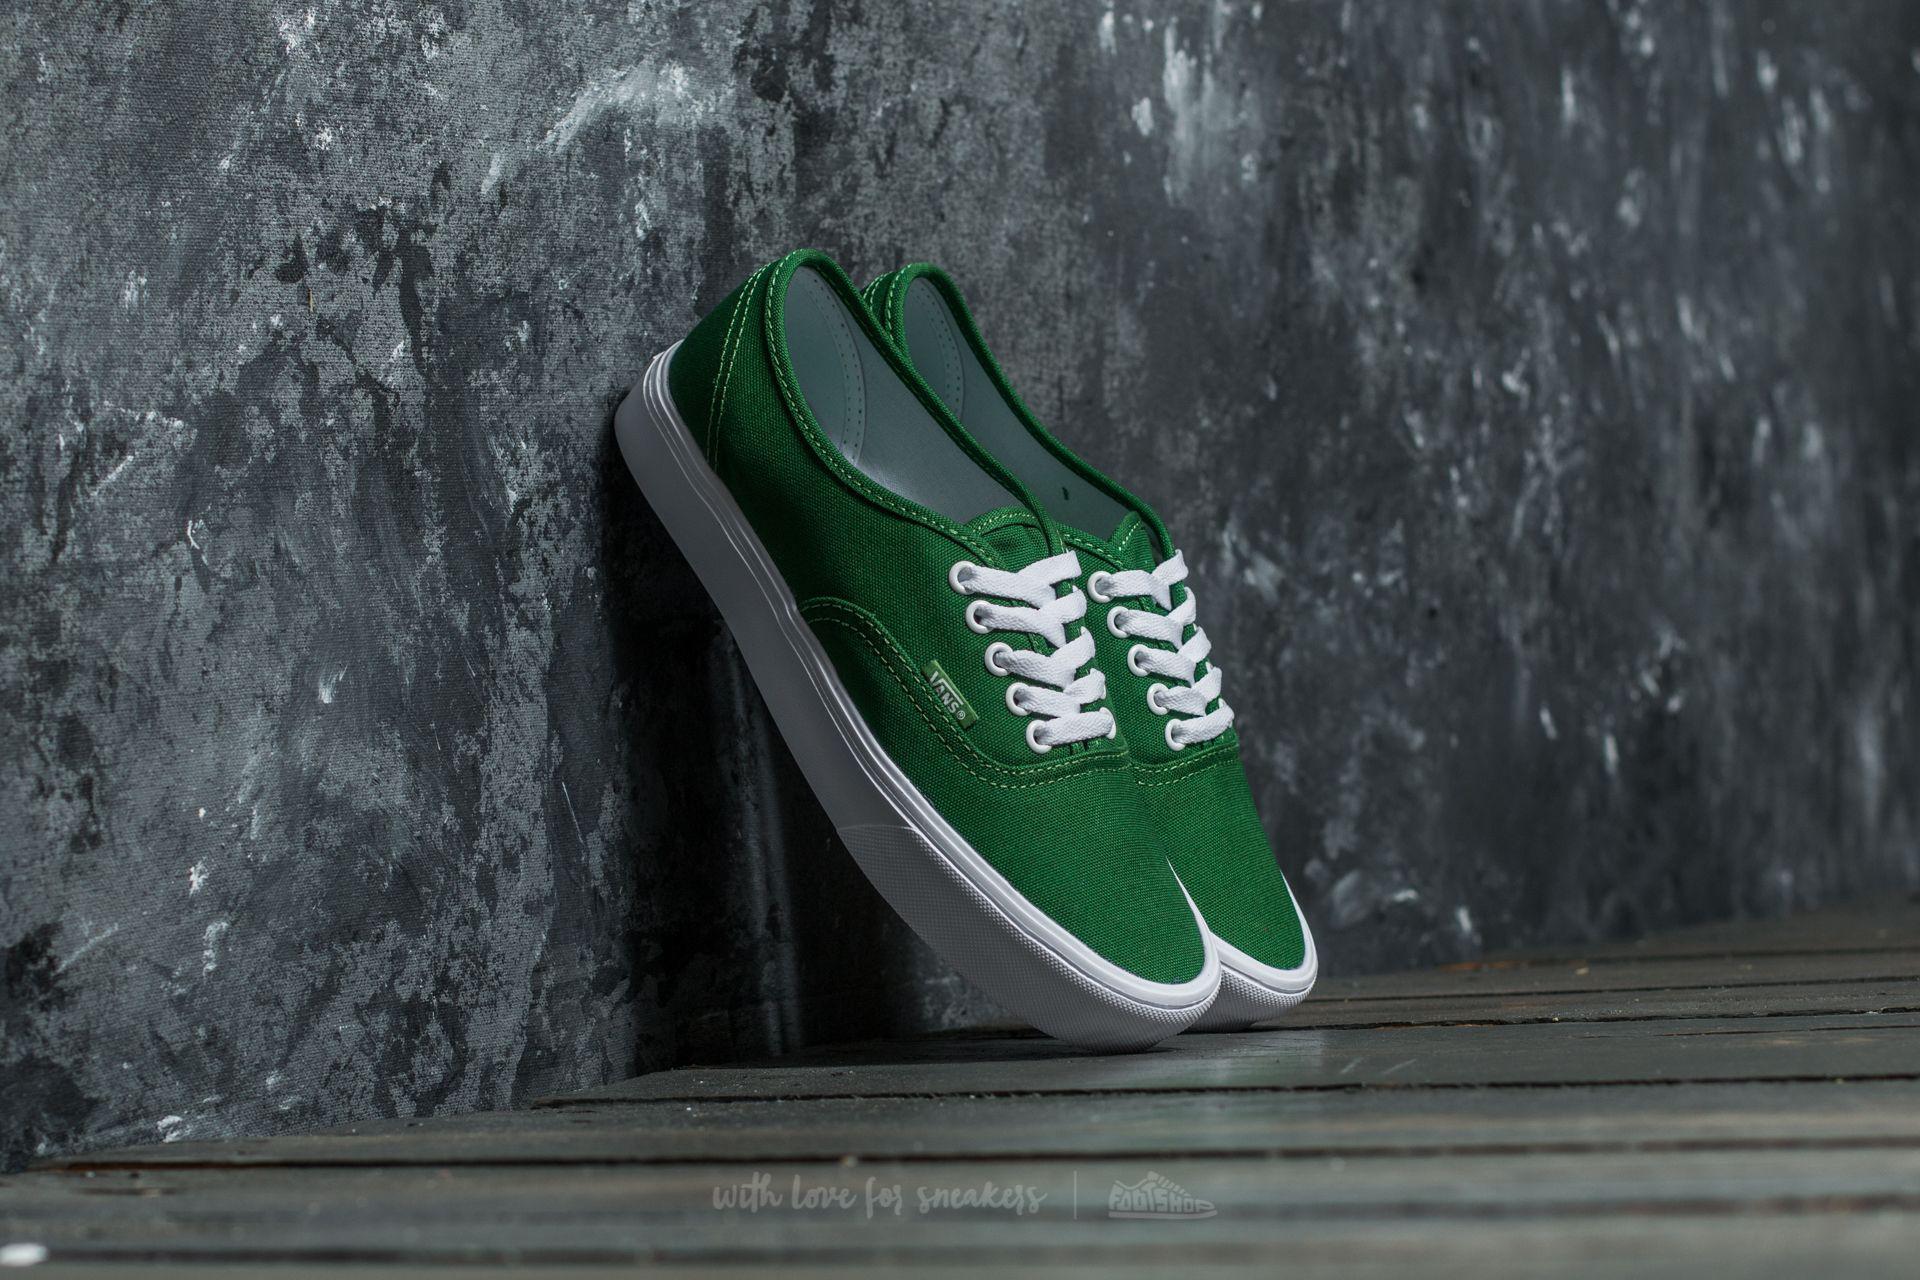 Lyst - Vans Authentic Lite (canvas) Juniper  True White in Green for Men 7c243fc43